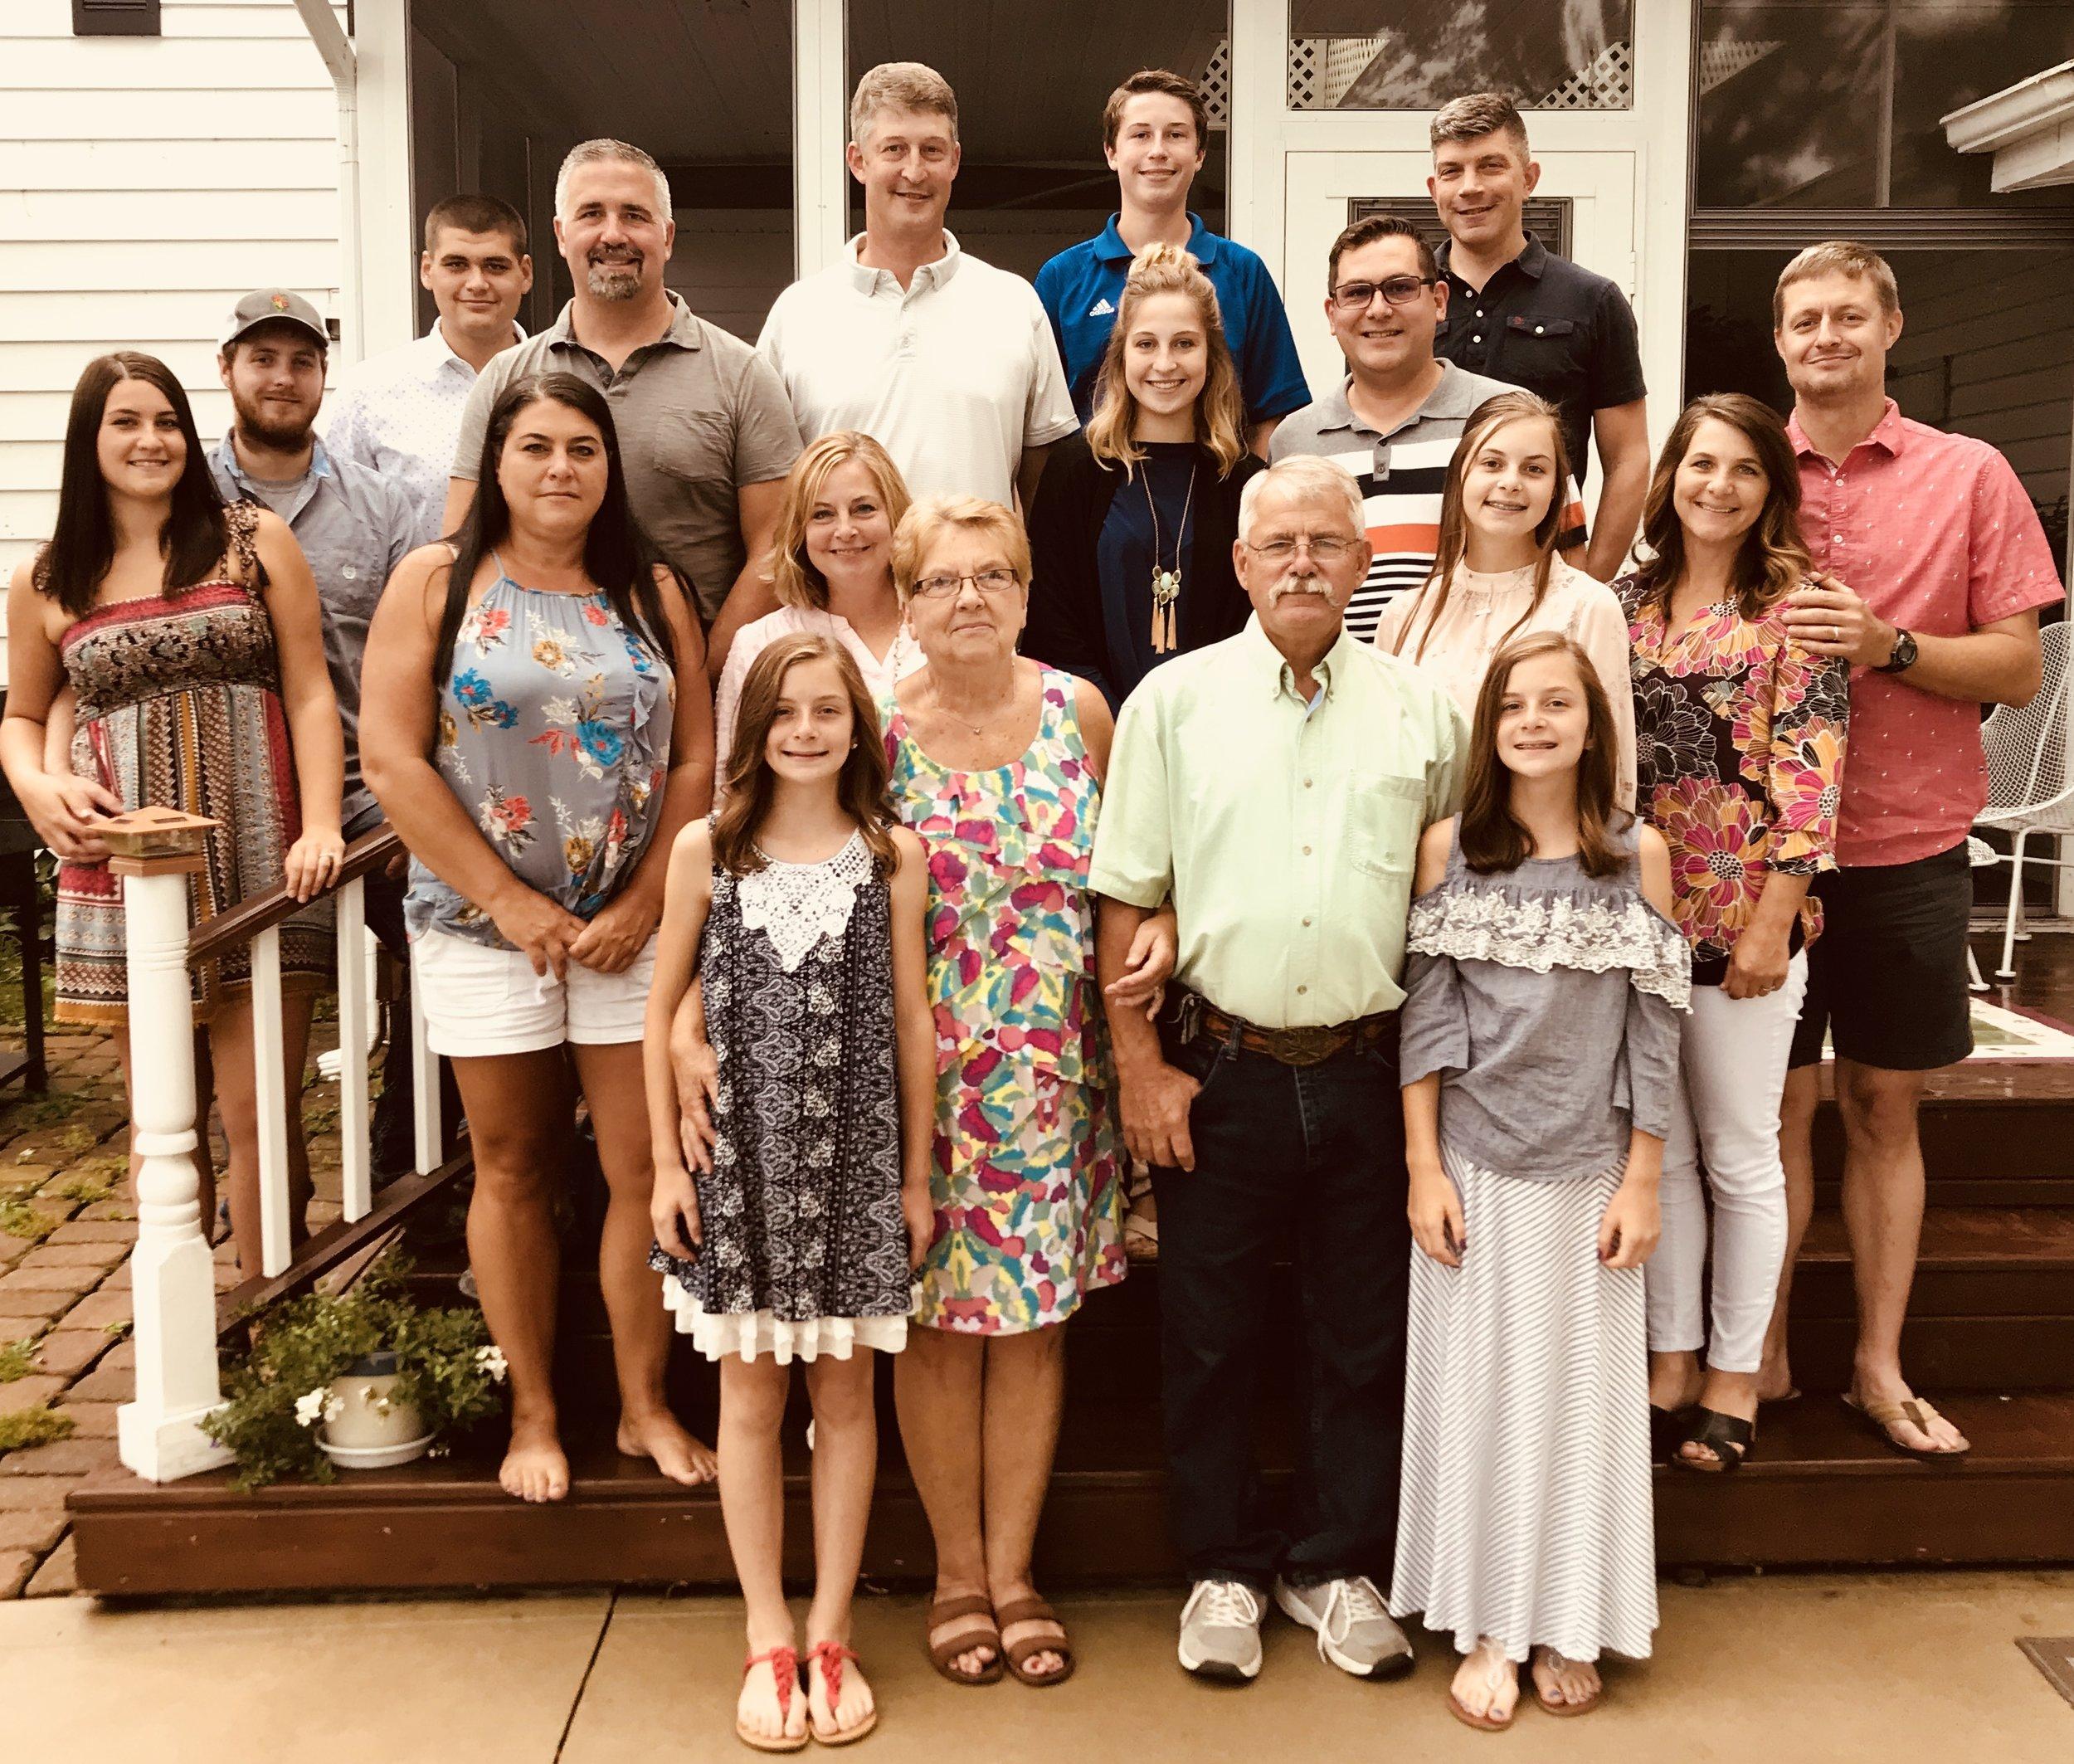 The Entire Collier Clan. LtoR: Taylor, Chris, Connor, Robin, Tim, Caitlyn, Terri, Doug, Linda, Dale, Claire, Jim, Rod, John, Cora, Kendyll, Heidi, and Deric